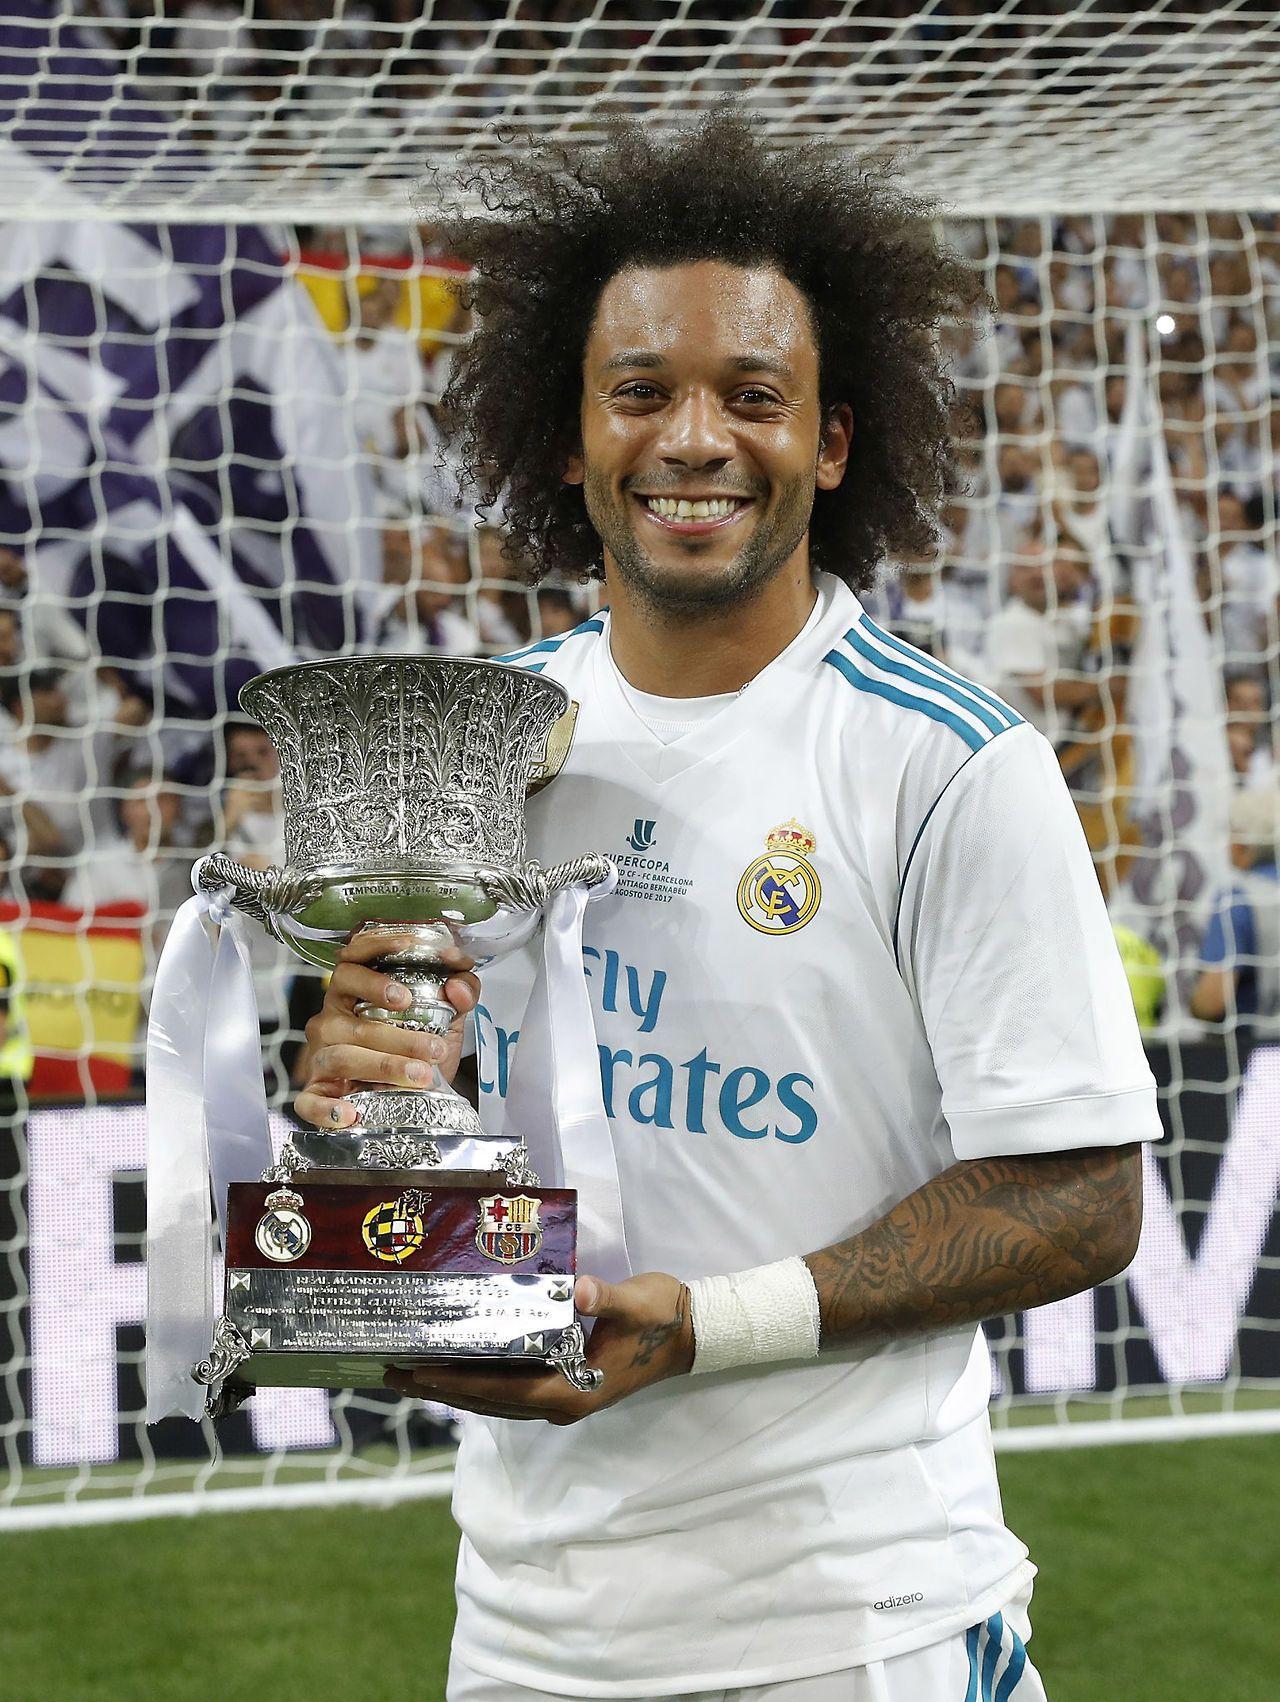 Marcelo. Supercopa de Espana, Final 2017.08.16 Real